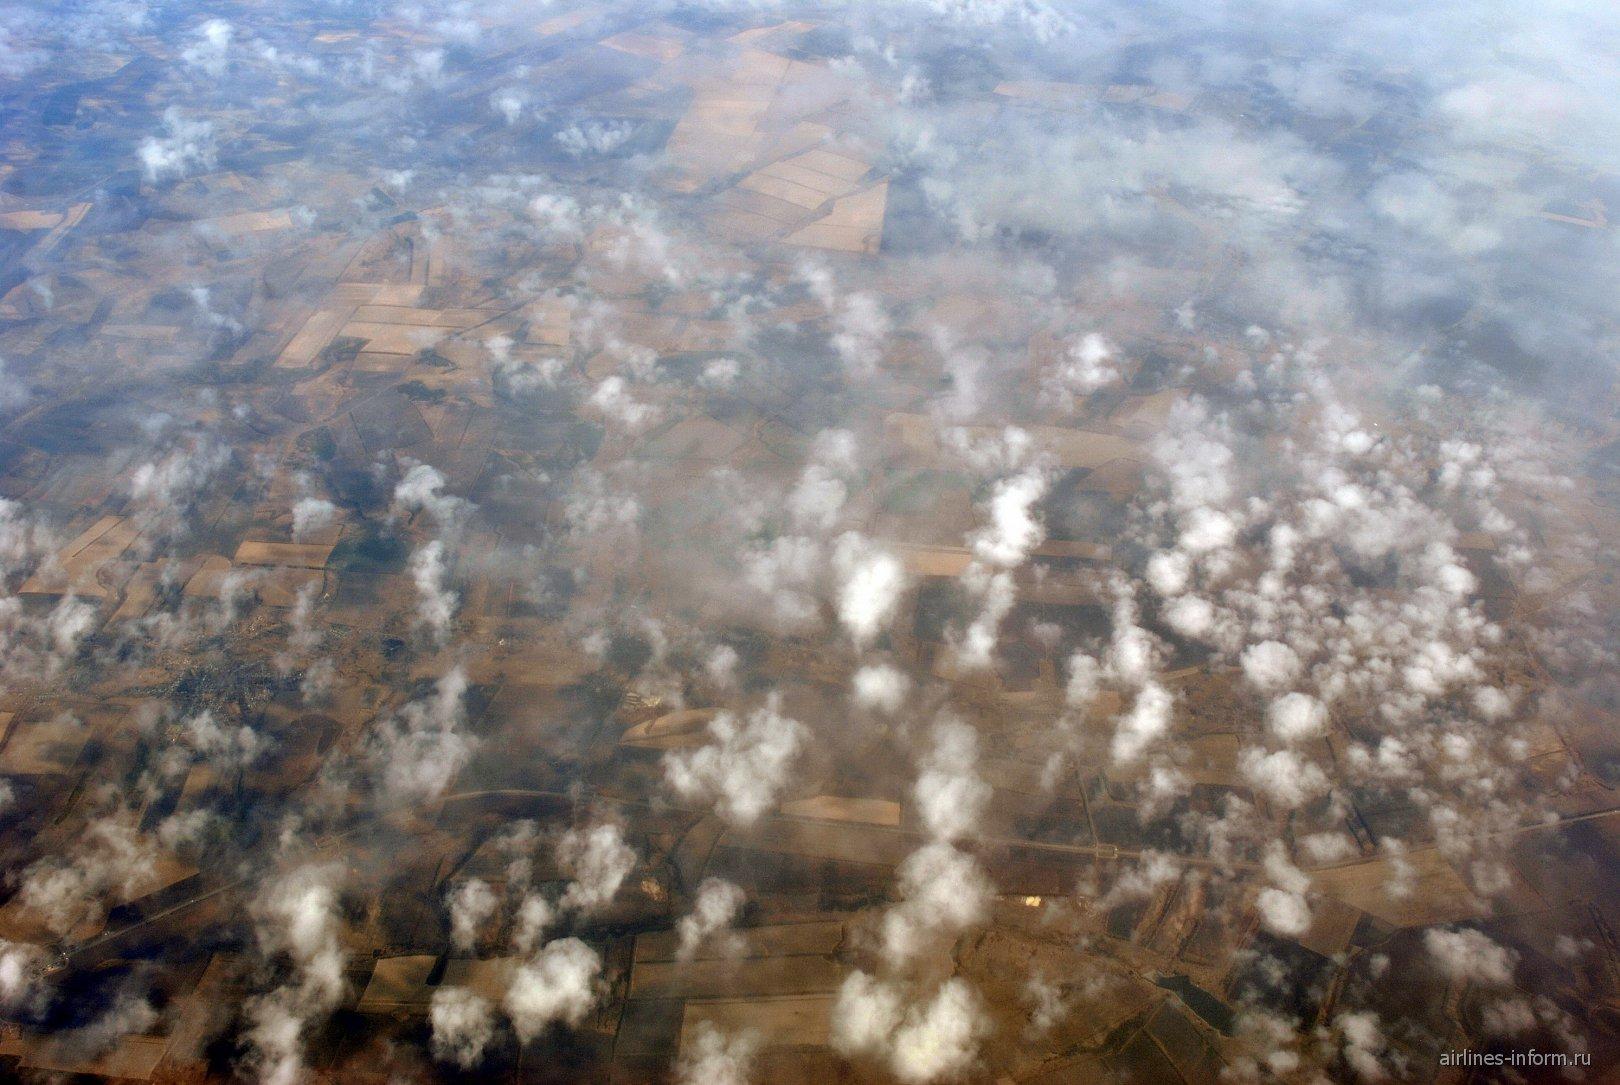 Облака-барашки в полете на юге России